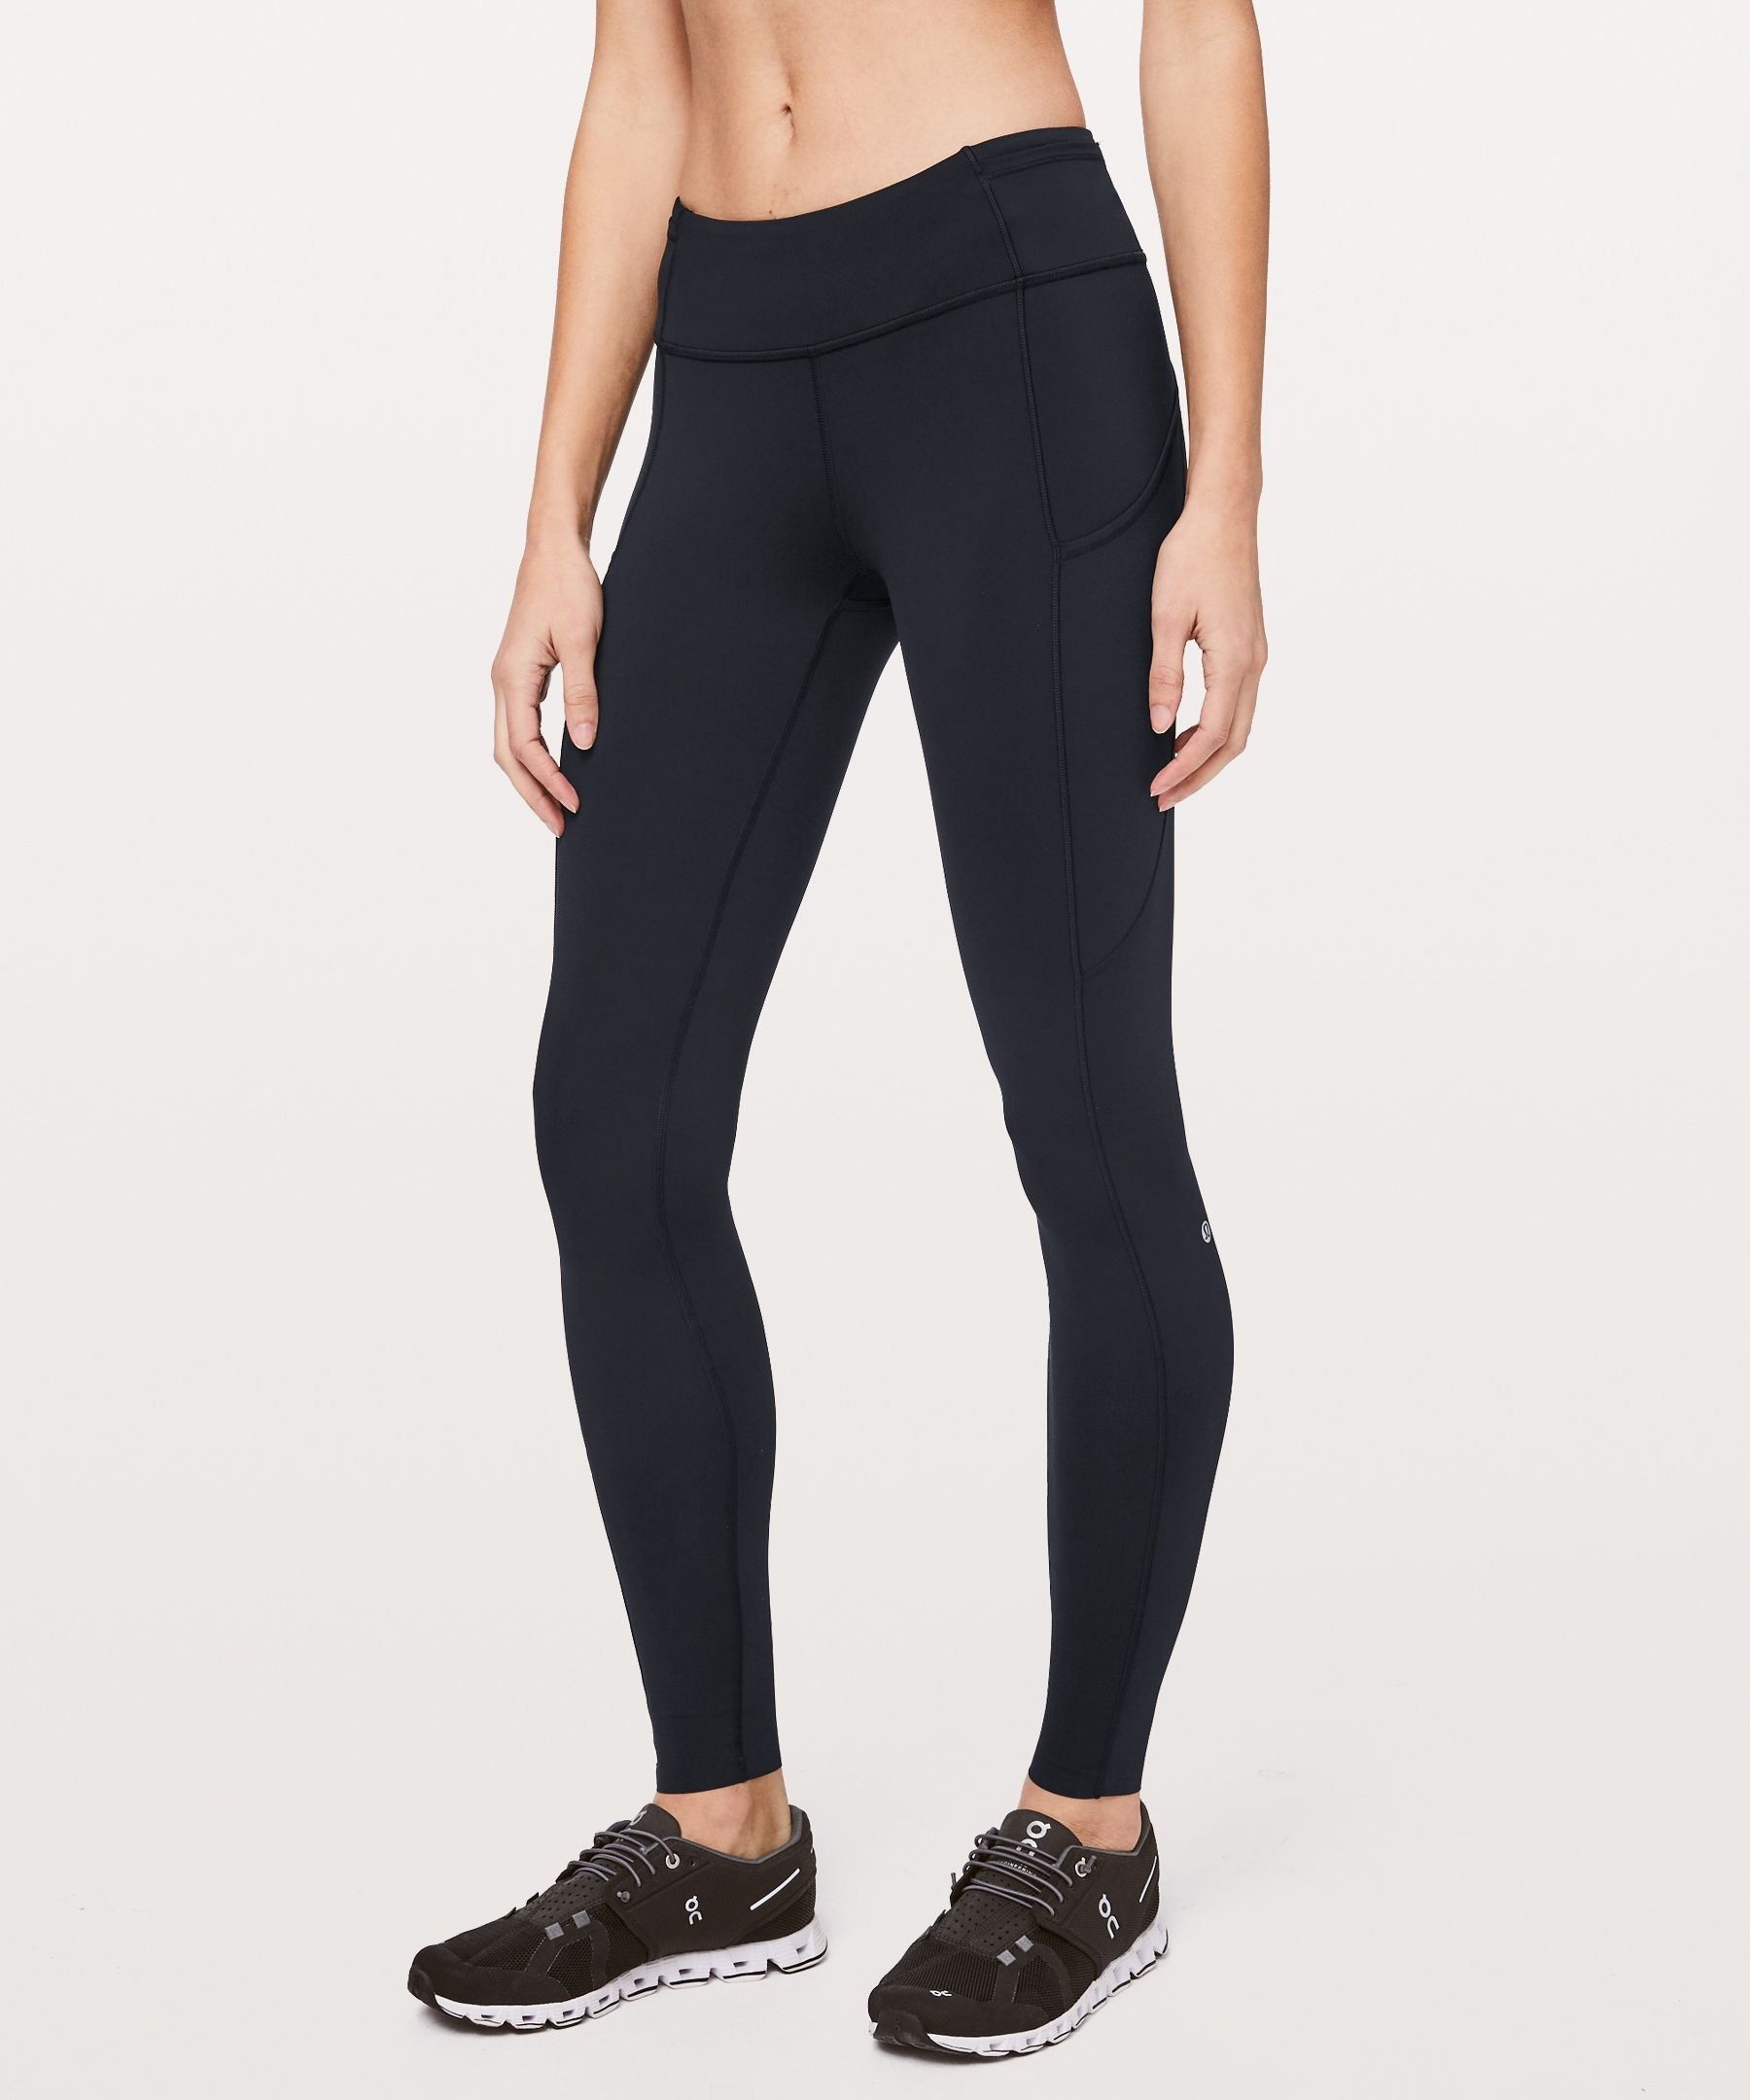 191b5bb87dc6e6 lululemon Women's Fast And Free Mid-Rise Legging 28